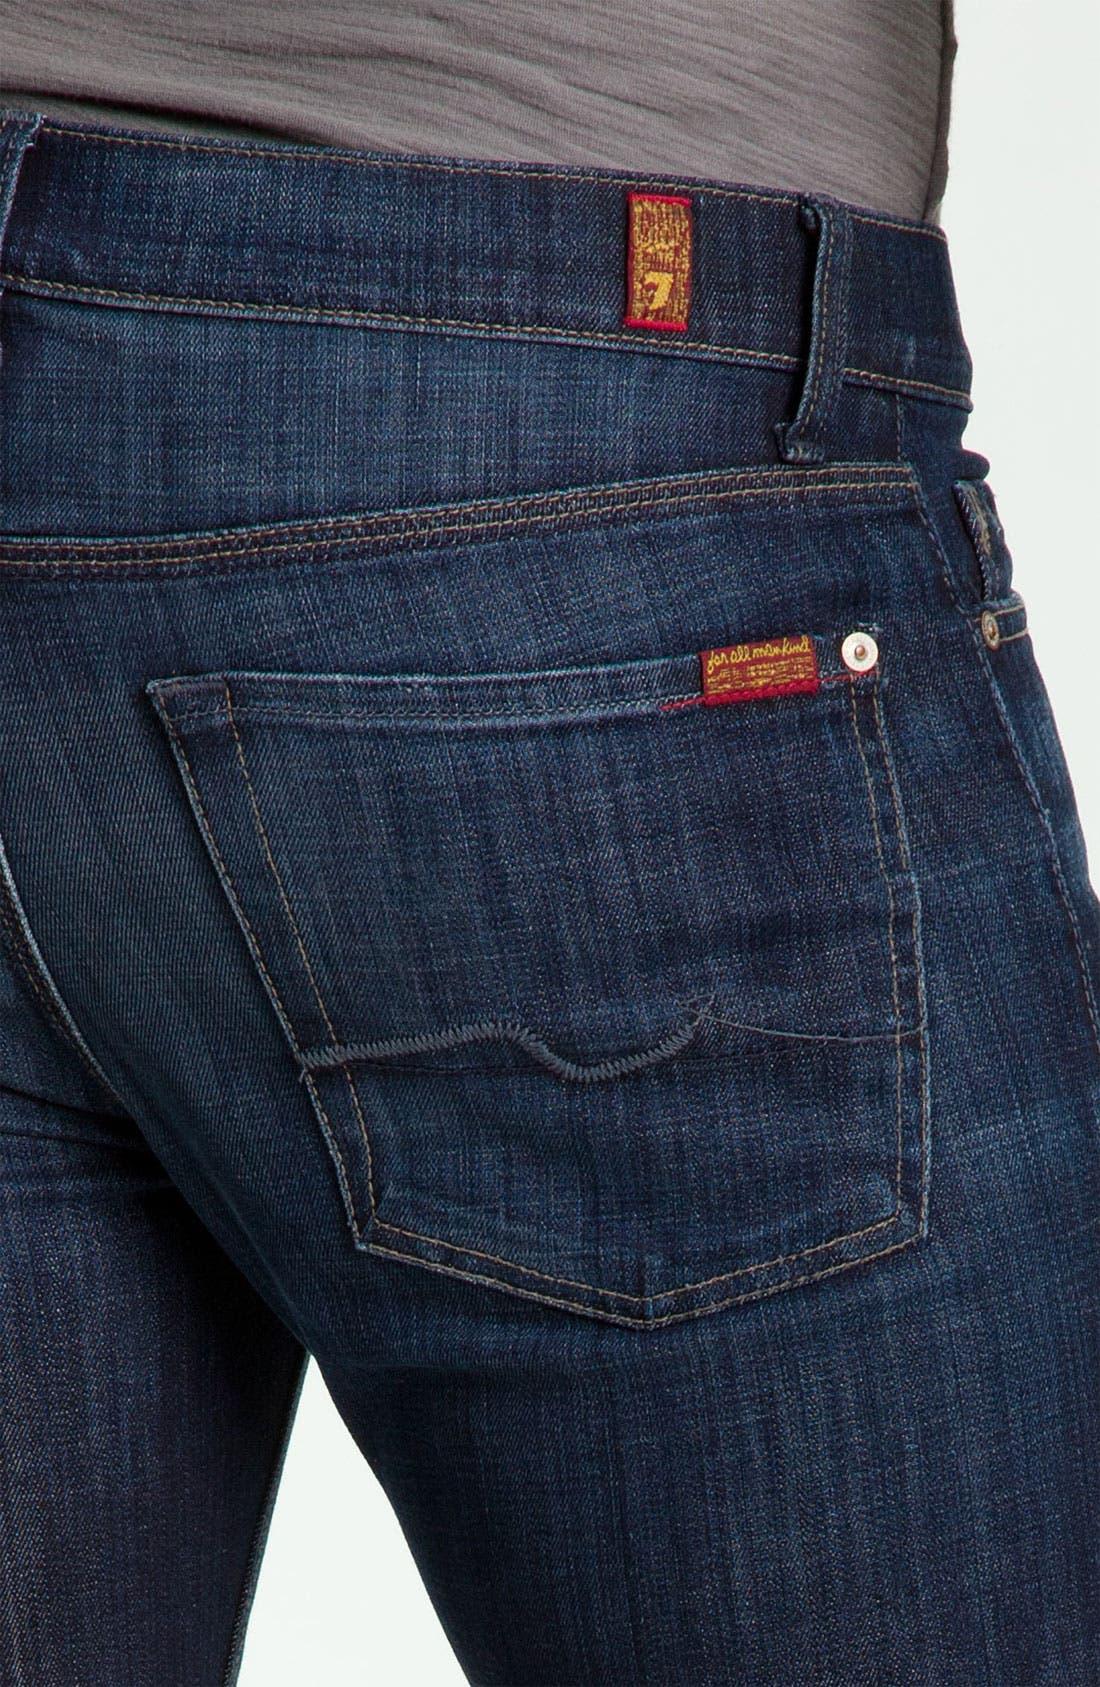 Slimmy Slim Fit Jeans,                             Alternate thumbnail 5, color,                             LOS ANGELES DARK